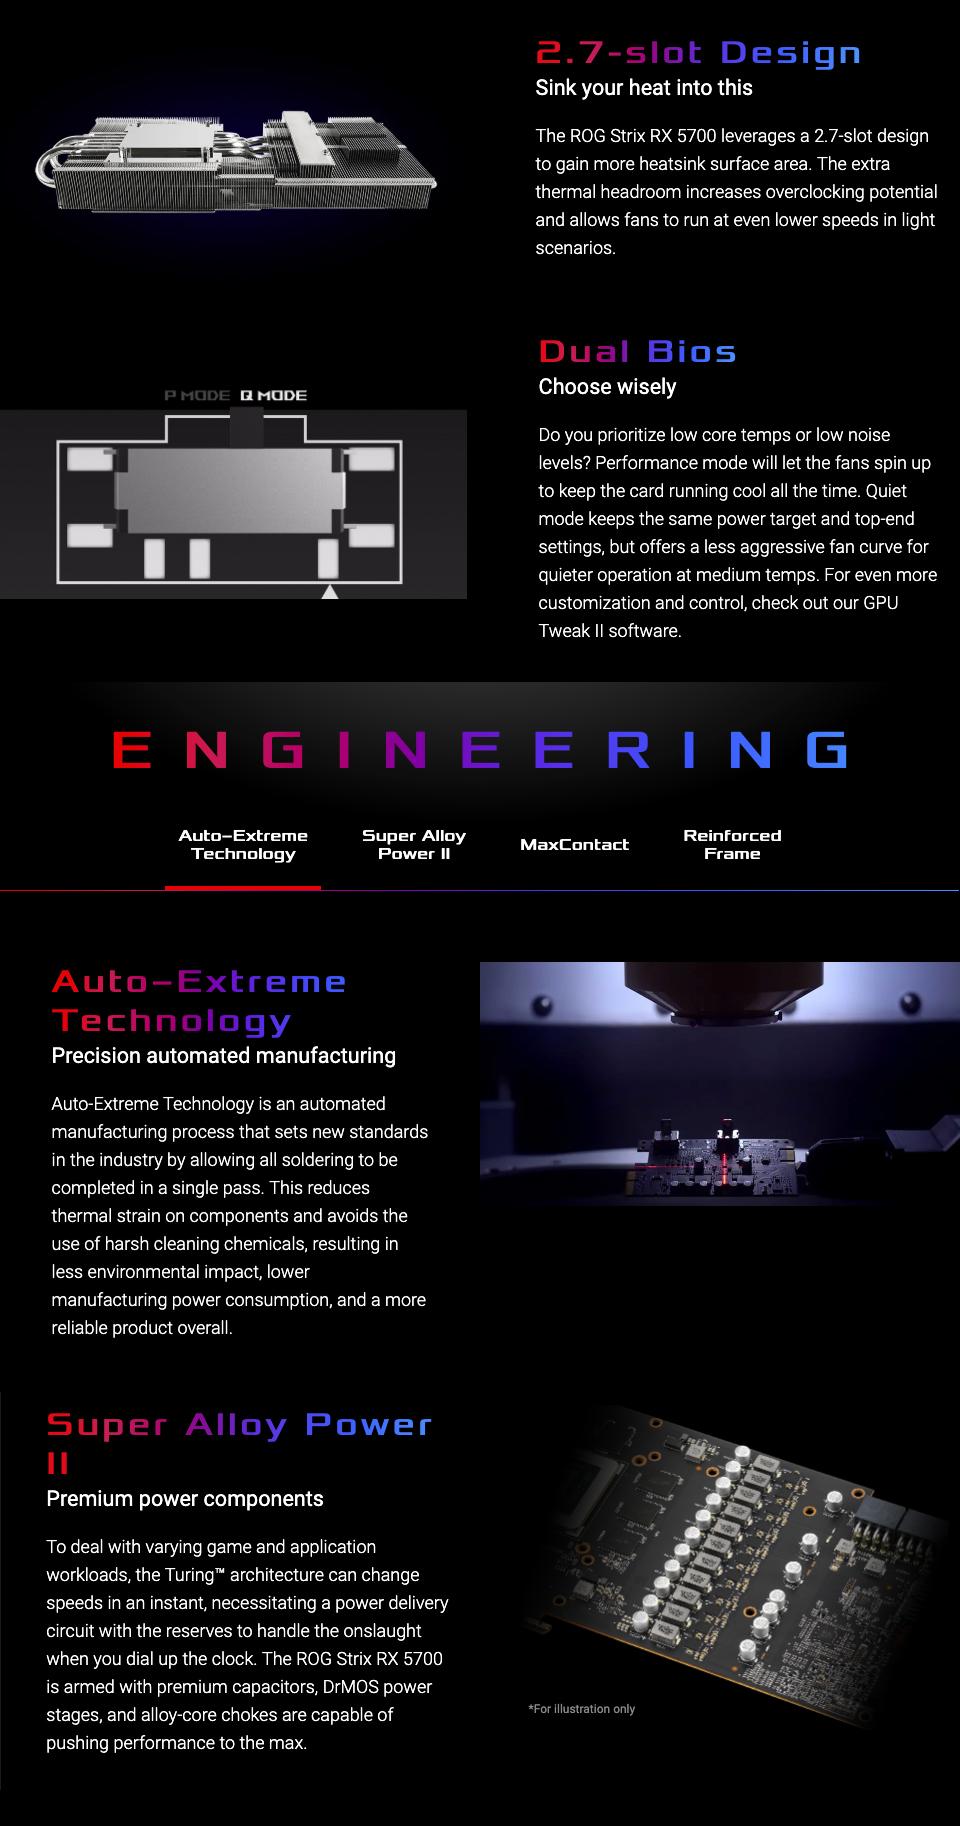 ASUS ROG Strix Radeon RX 5700 OC 8GB